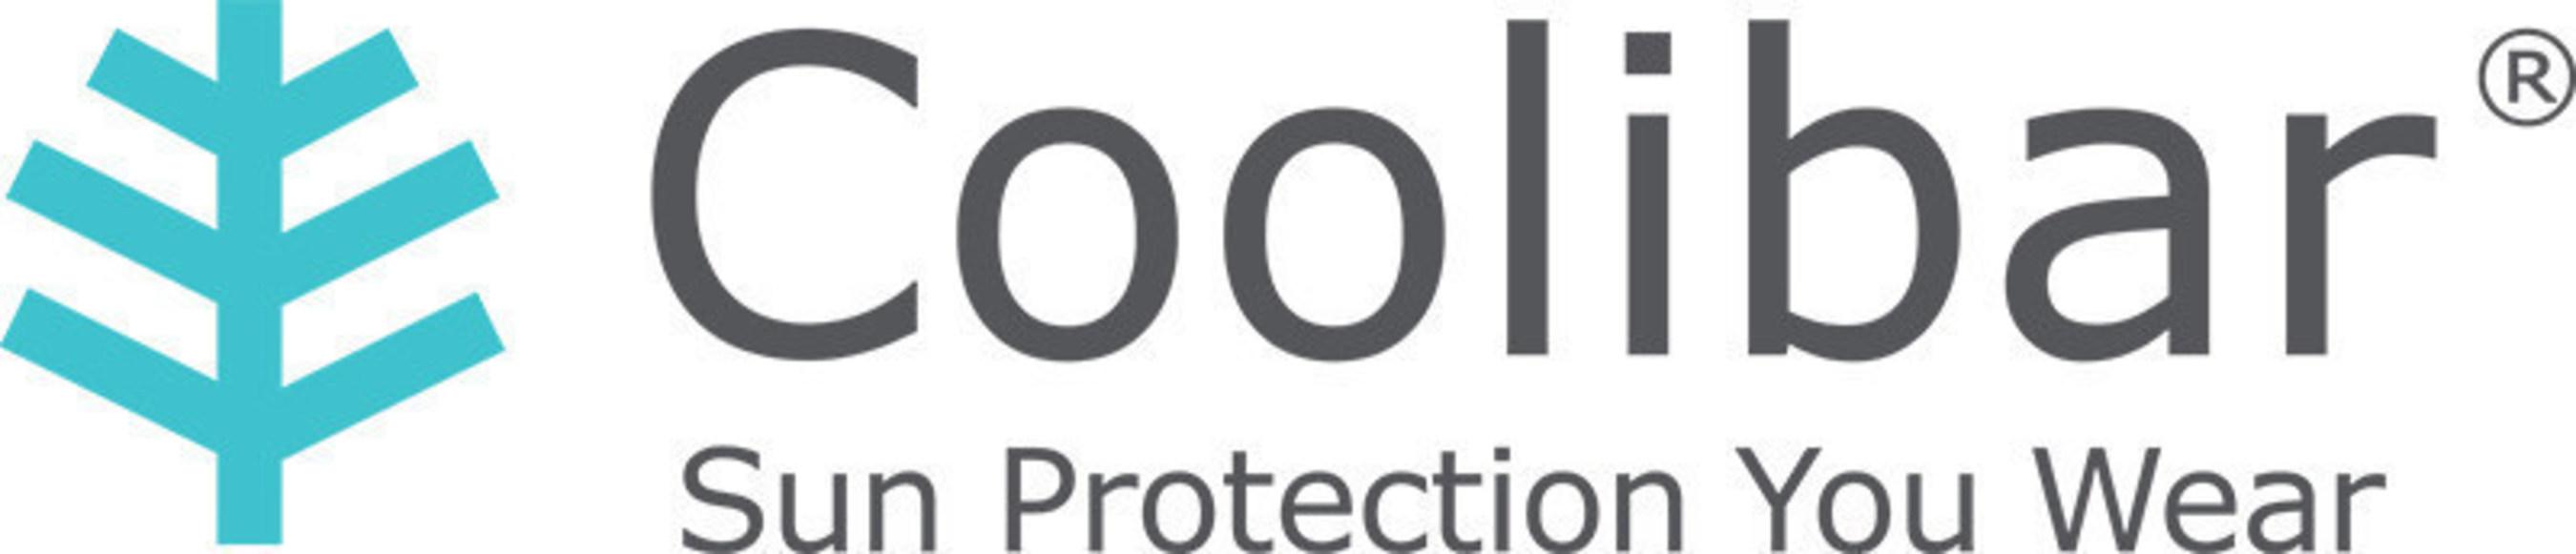 Coolibar, Inc. Logo